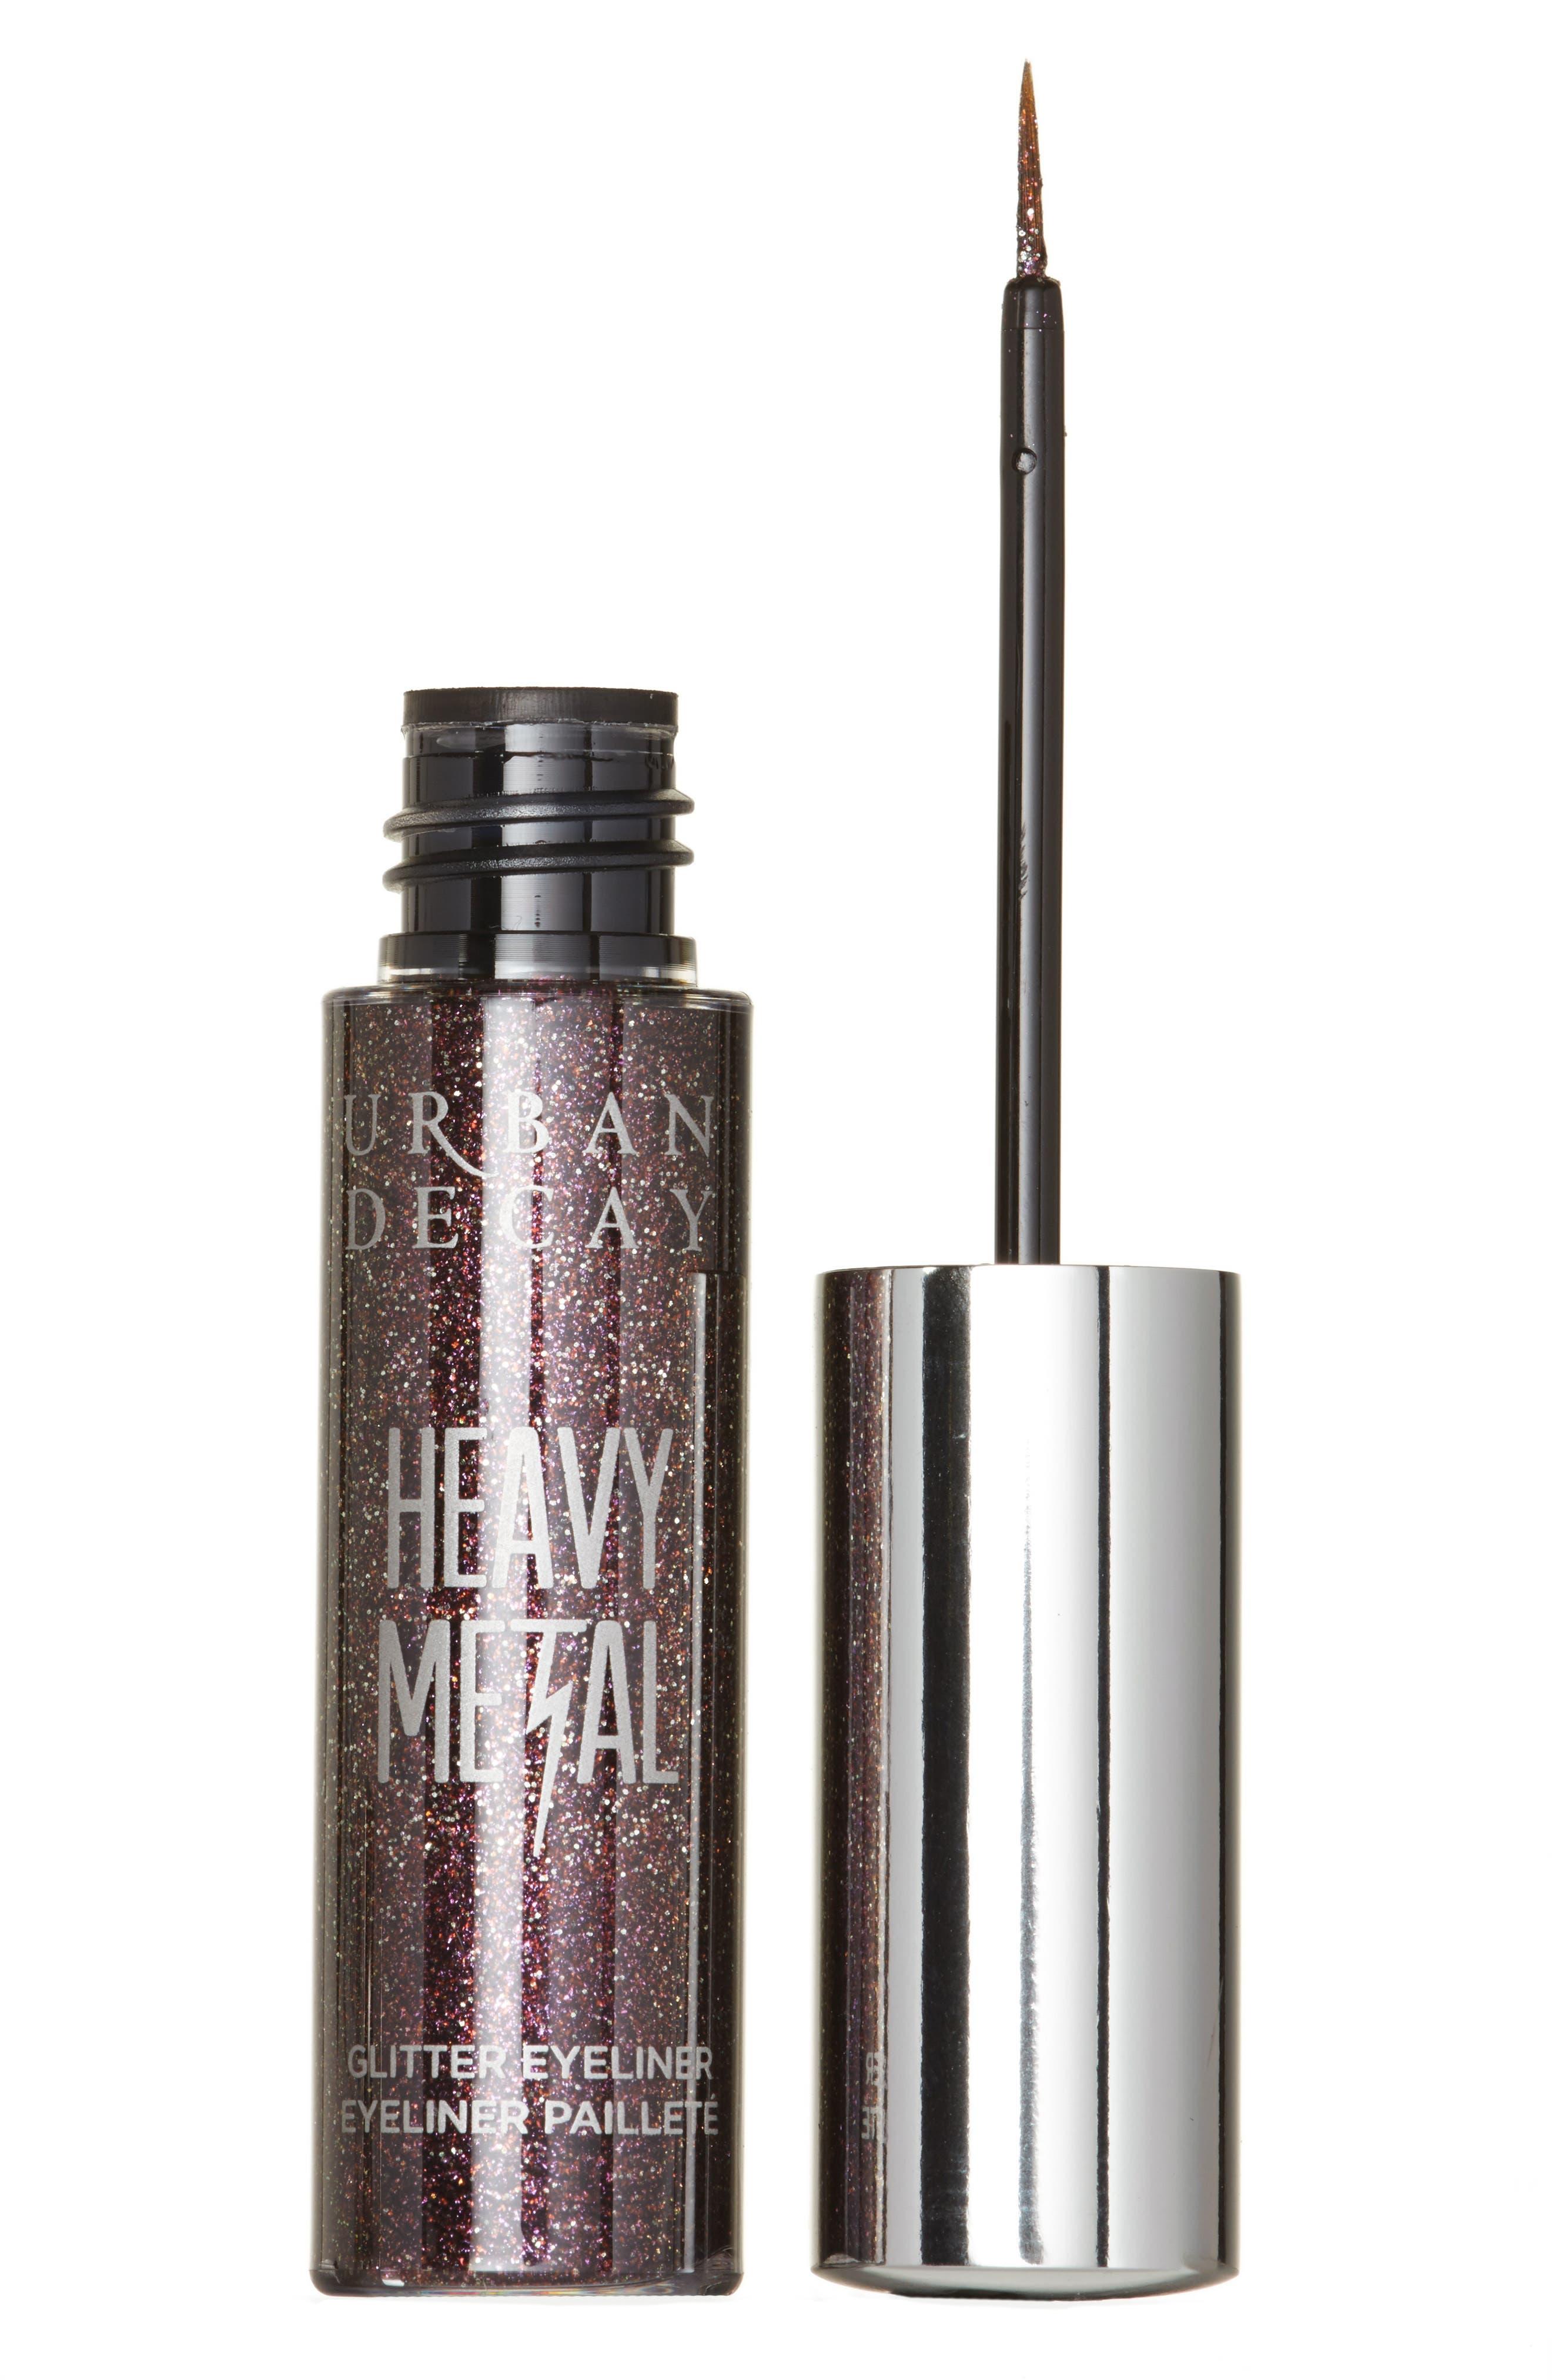 Heavy Metal Glitter Eyeliner,                             Main thumbnail 6, color,